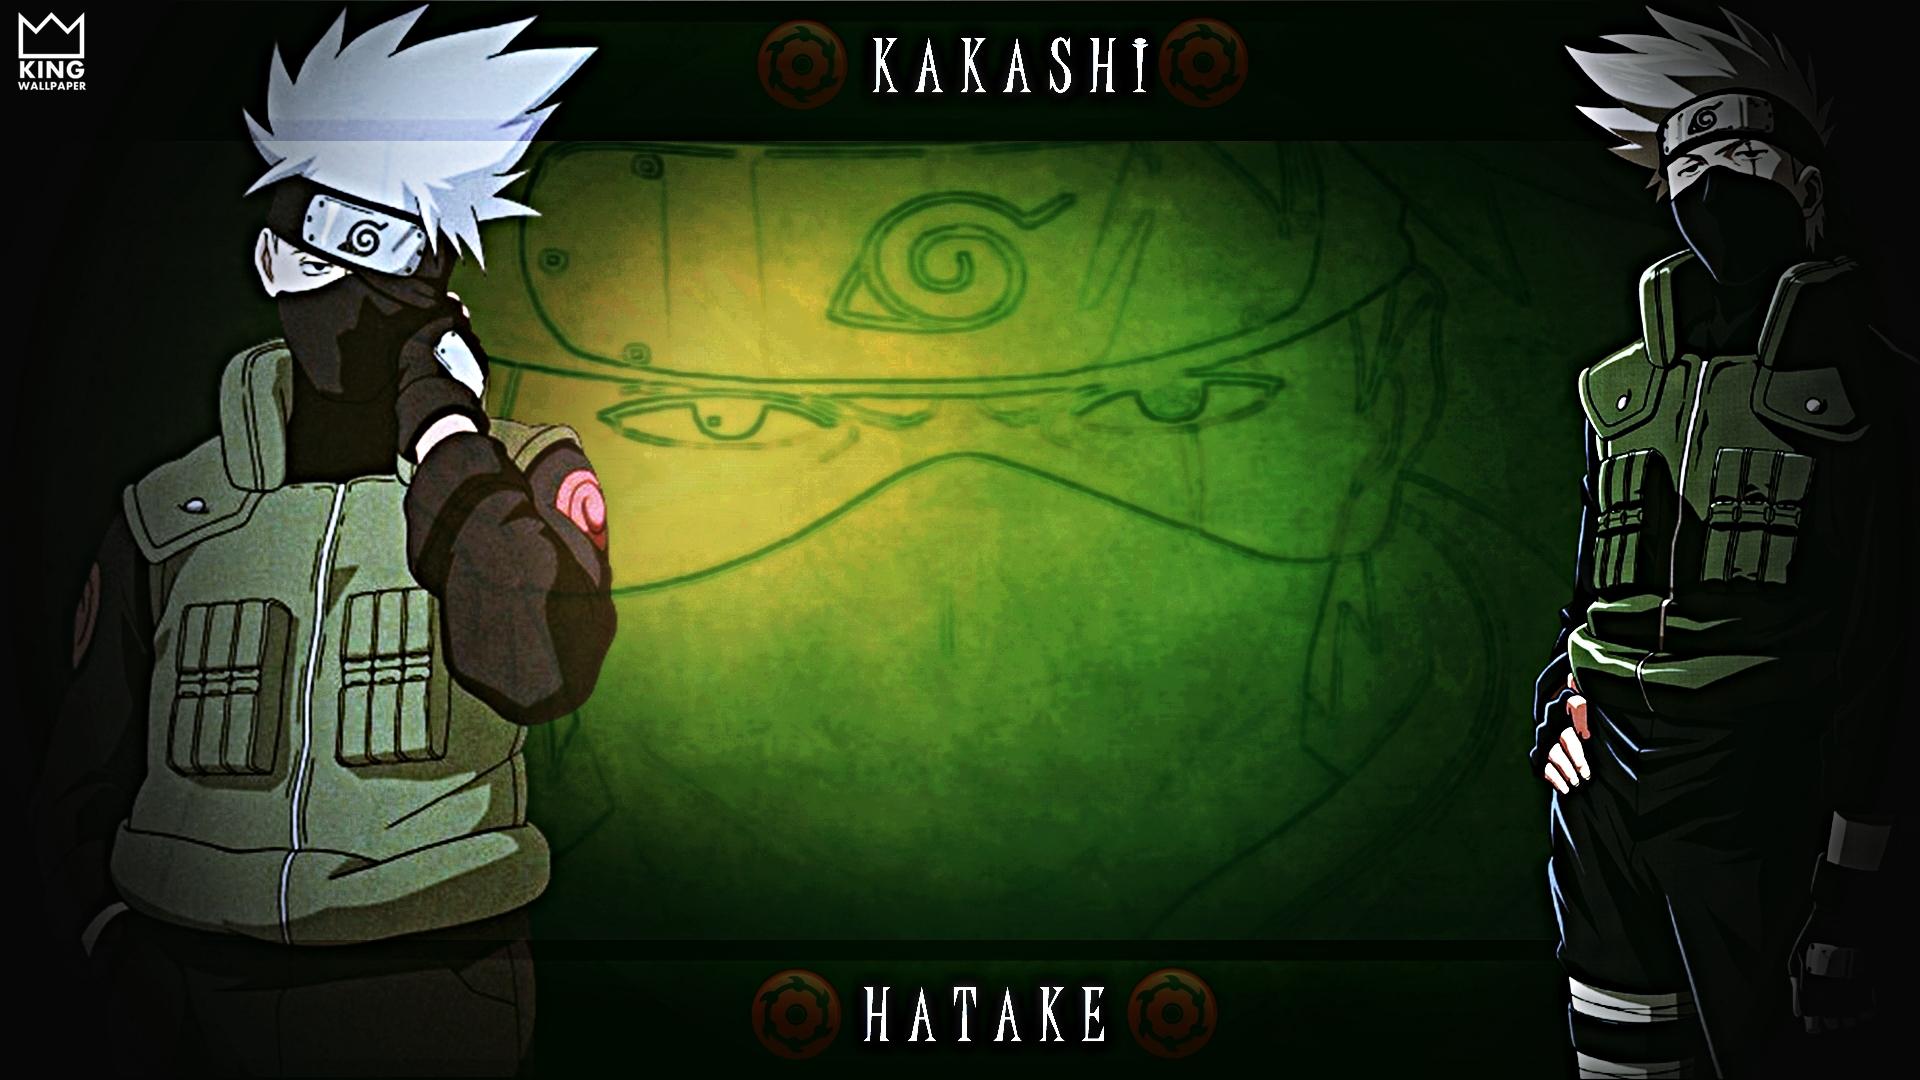 Kakashi Hatake Wallpaper - @Naruto by Kingwallpaper on DeviantArt